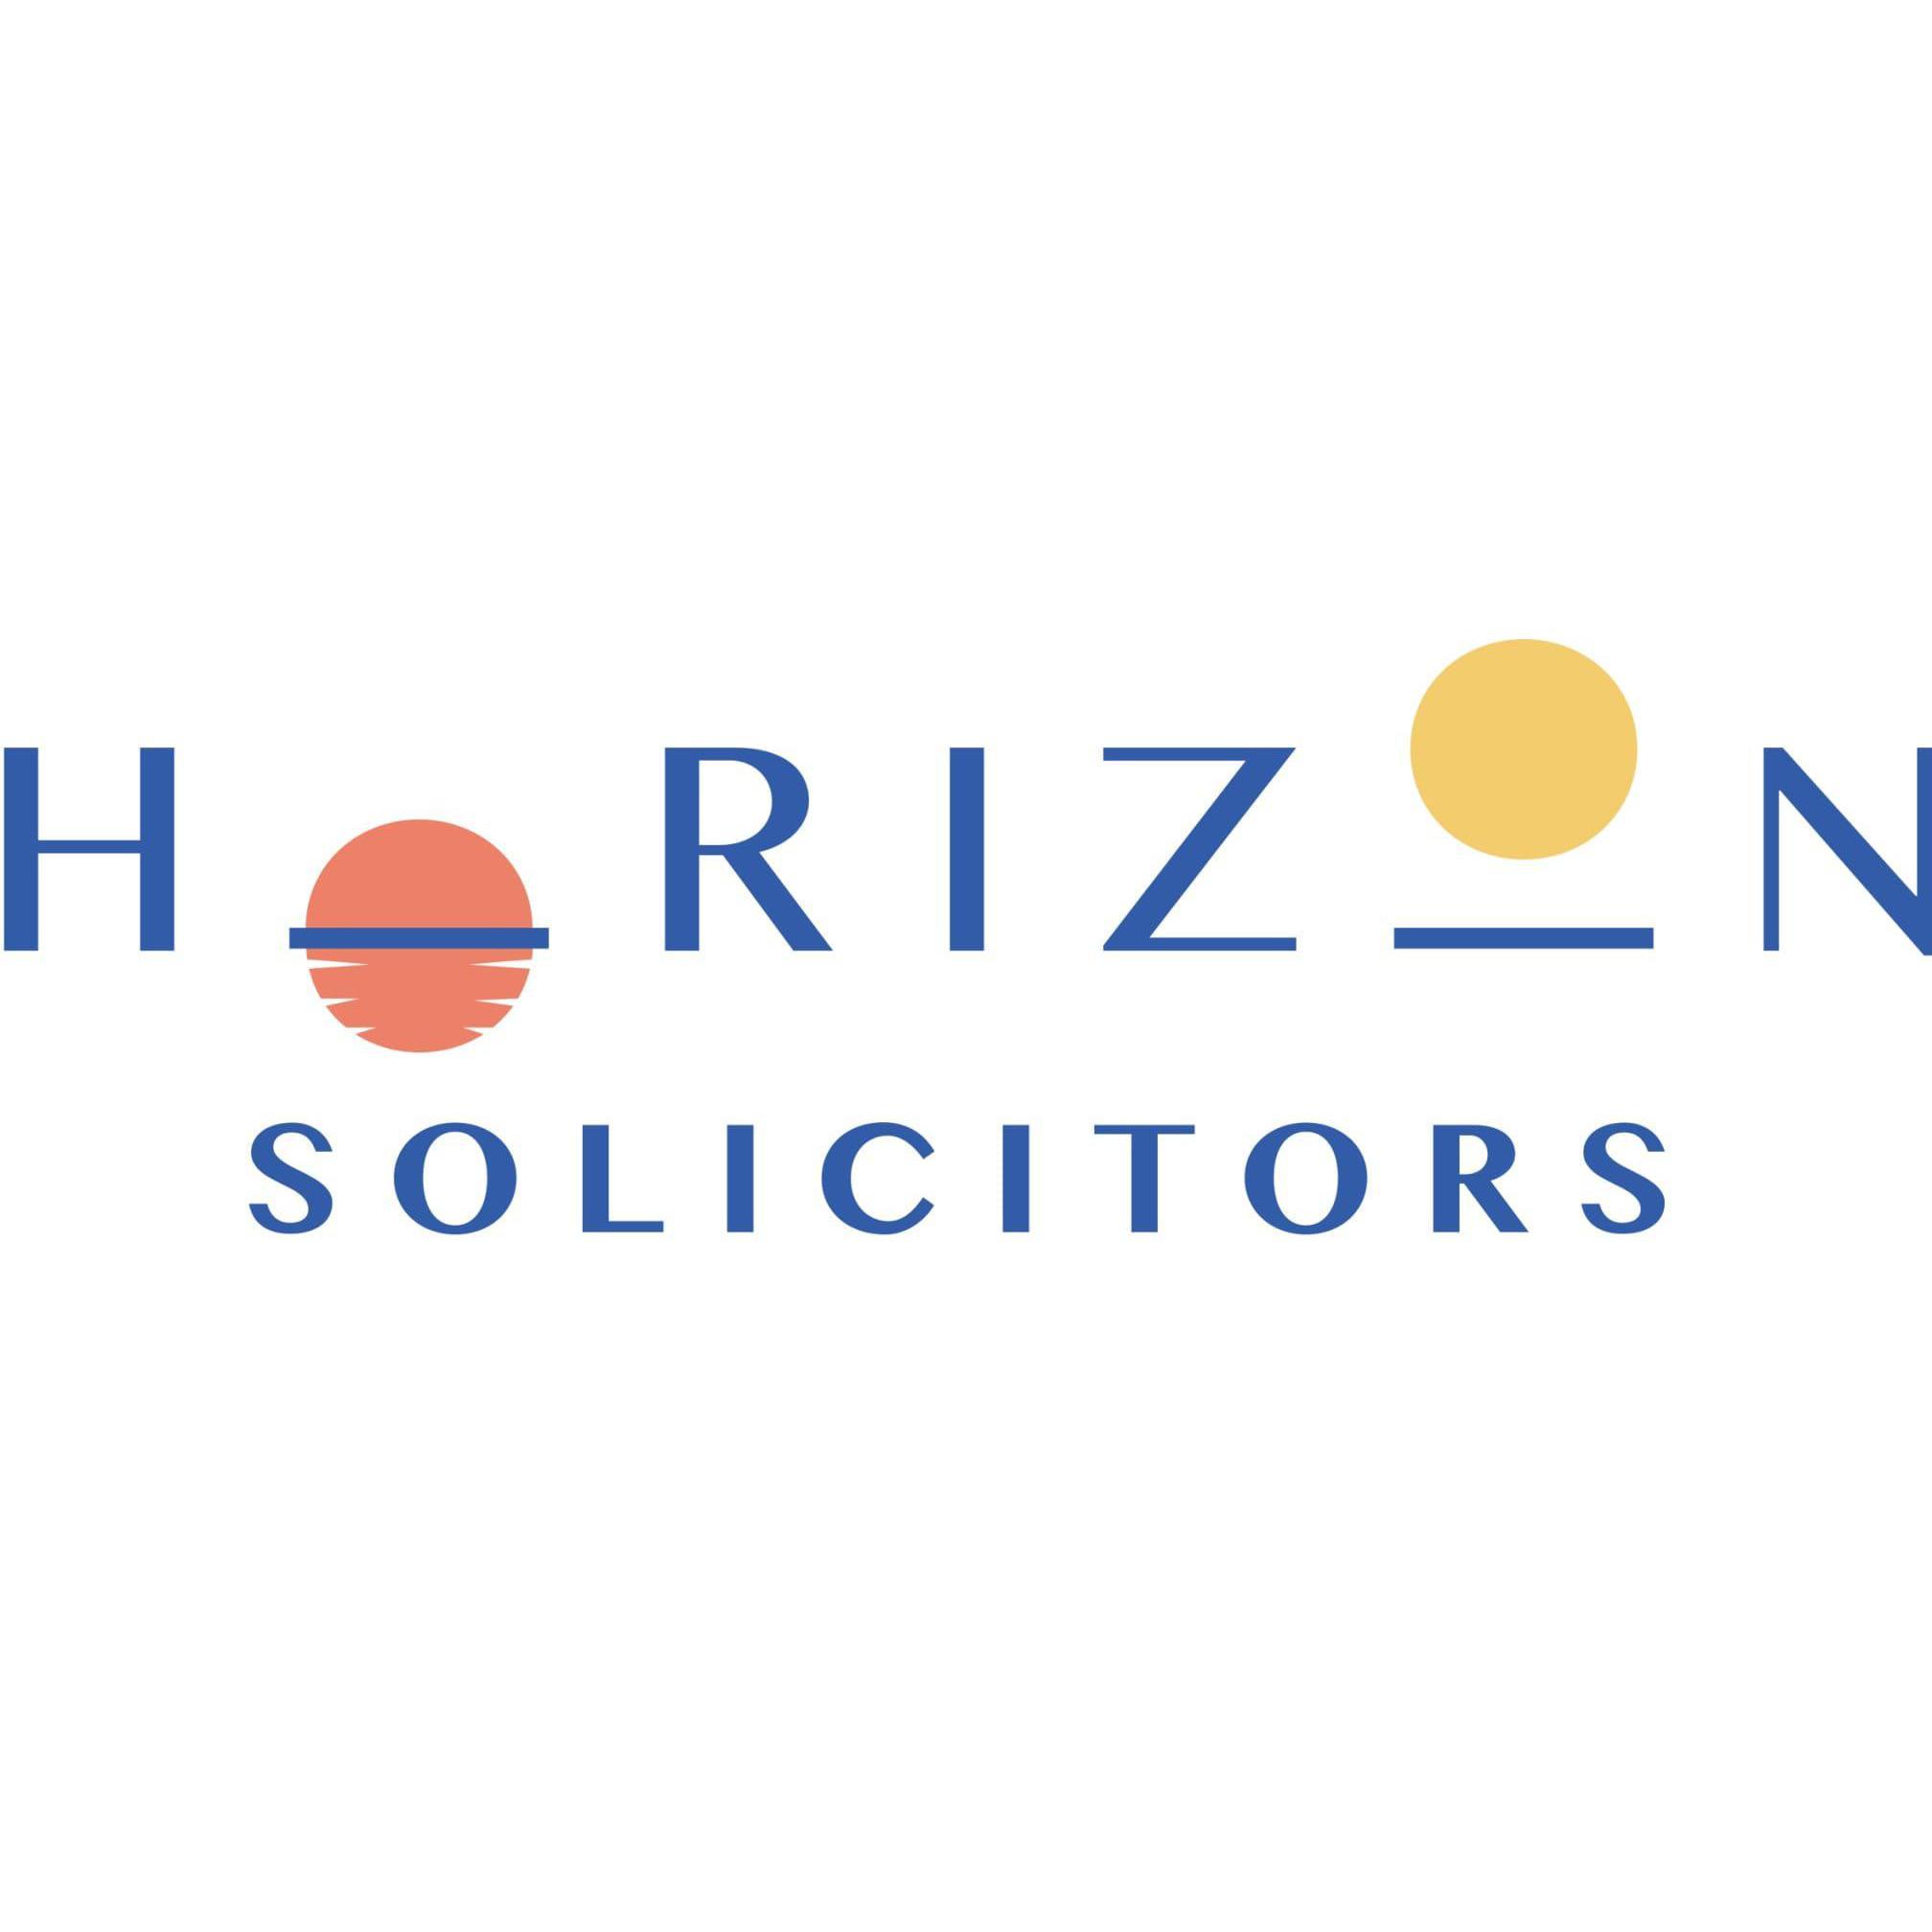 Horizon Solicitors - Rugby, Warwickshire CV21 3QP - 01788 555045 | ShowMeLocal.com